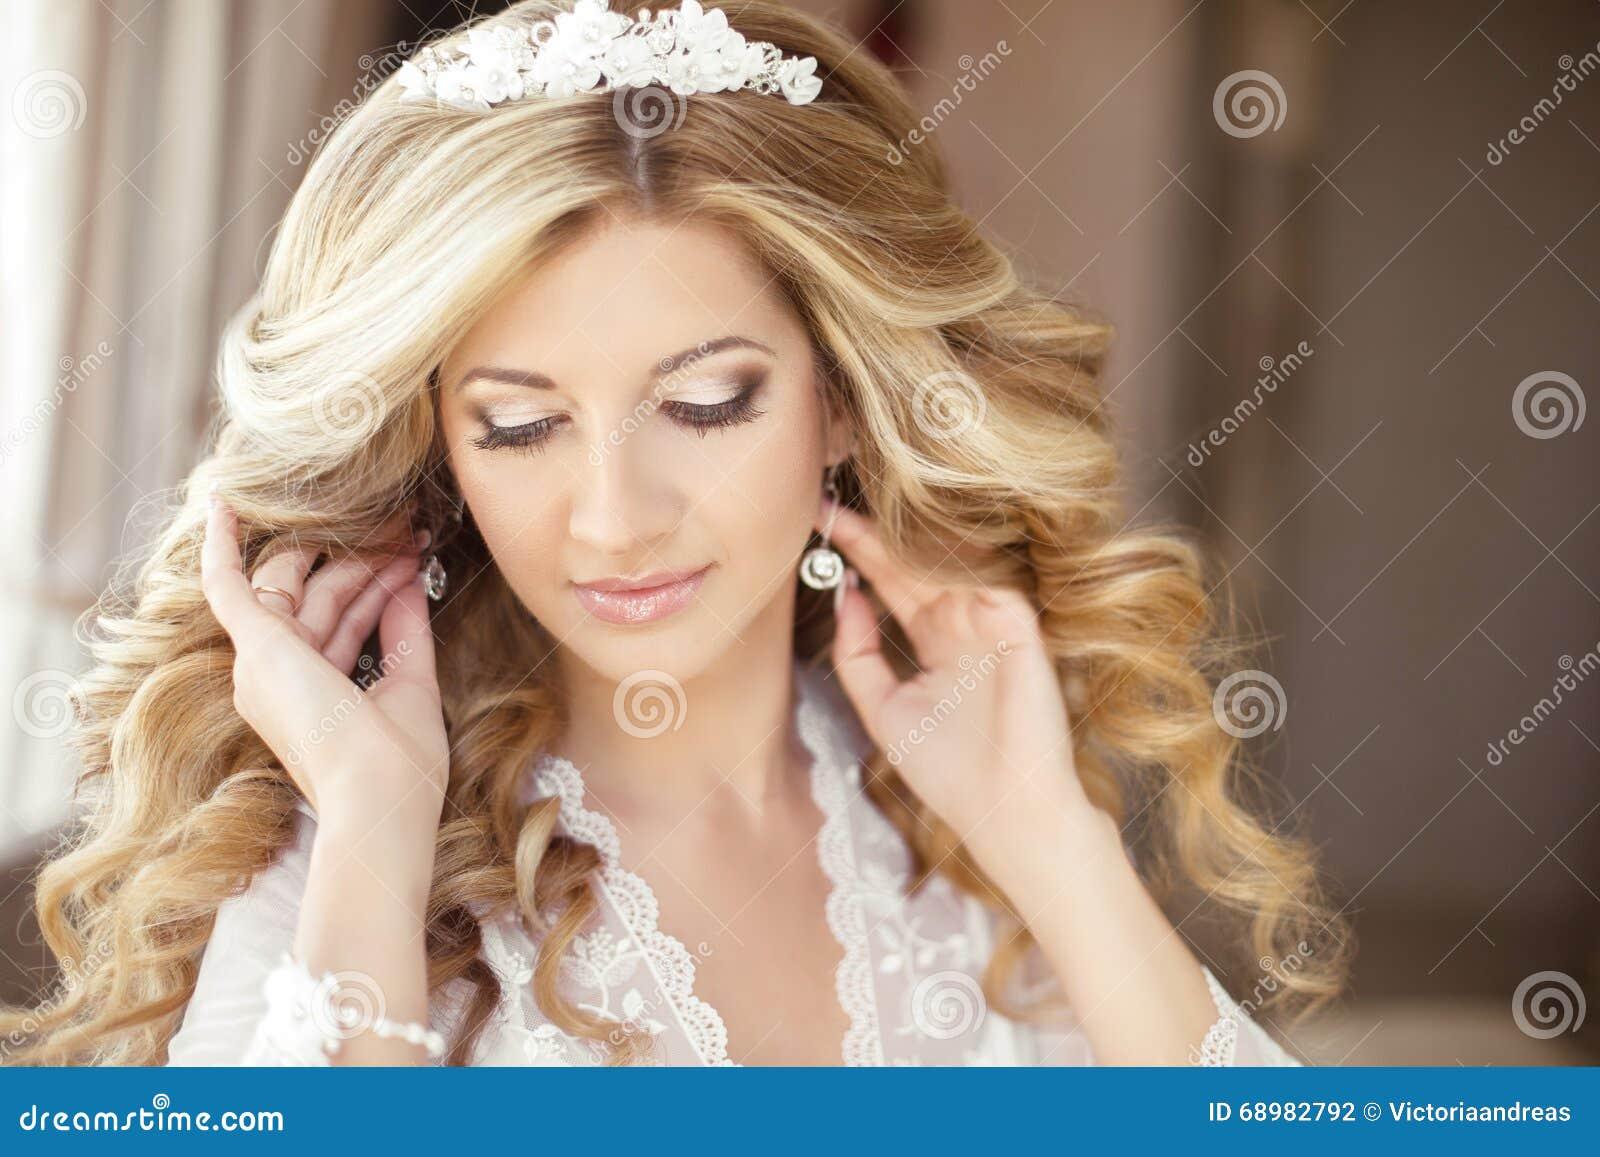 Maquillaje Retrato de boda hermoso de la novia con el peinado de la boda,